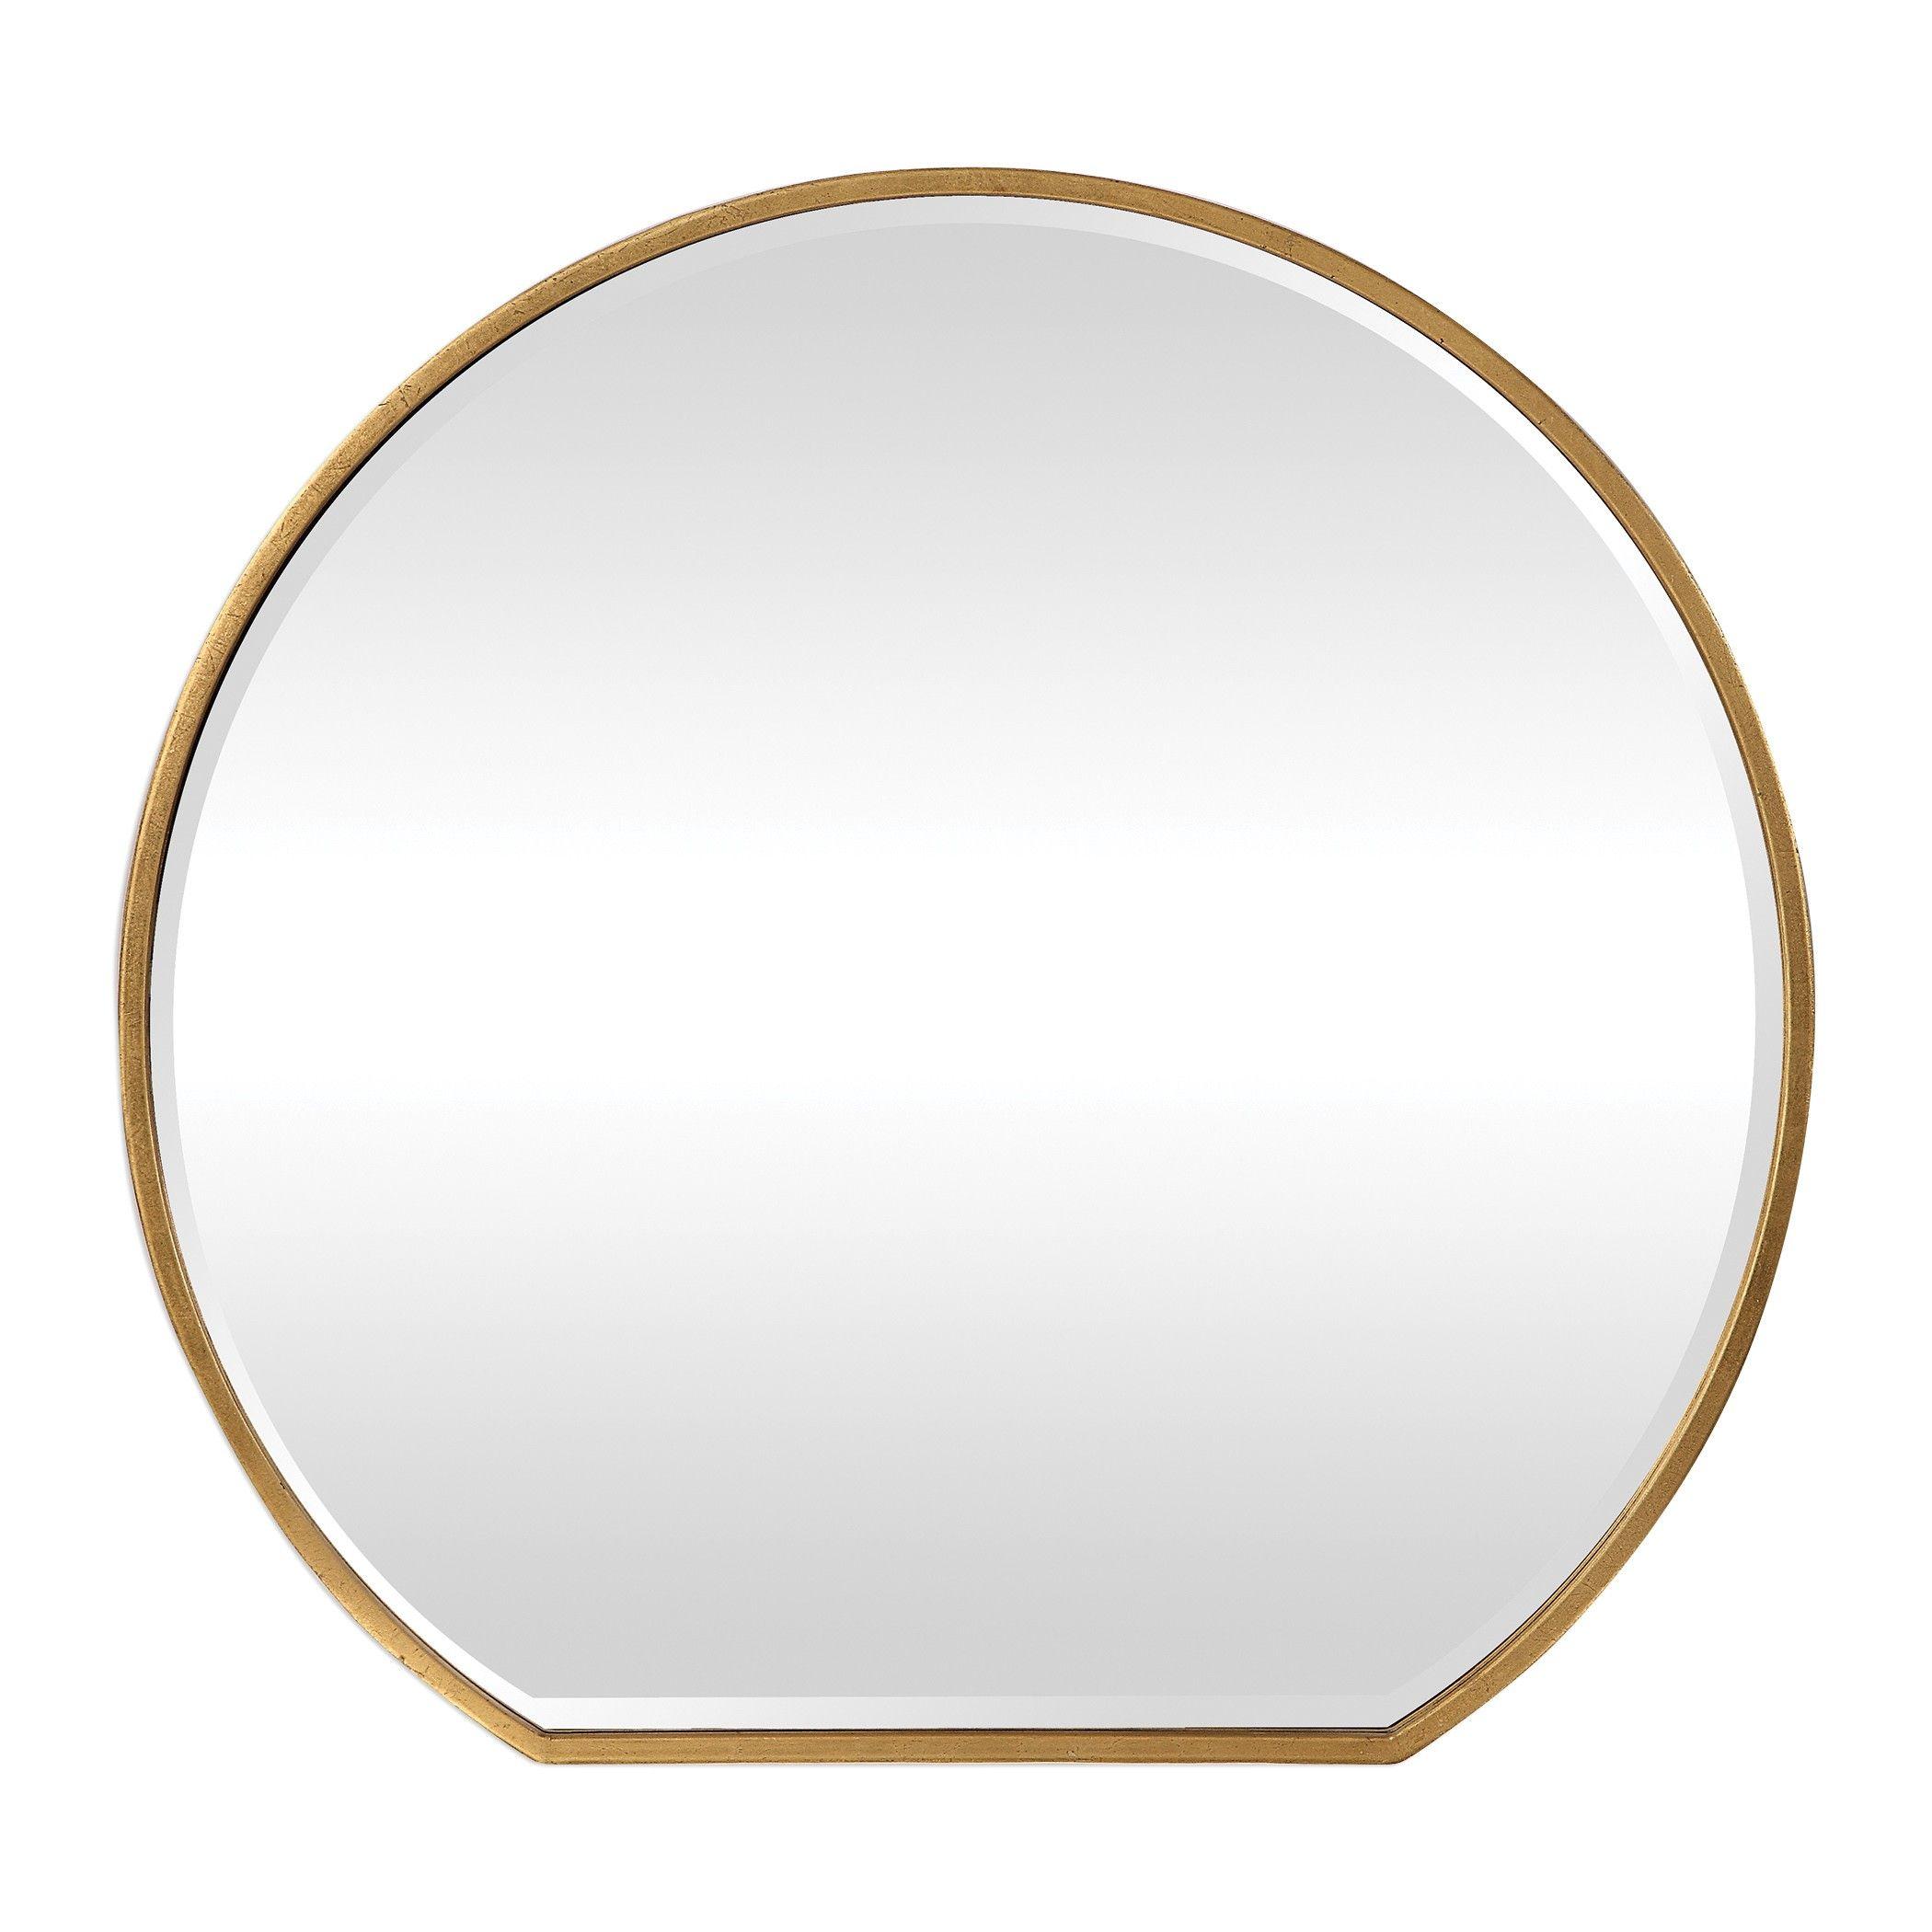 Alexandra Mirror Gold Mirror Wall Gold Leaf Mirror Metallic Gold Leaf